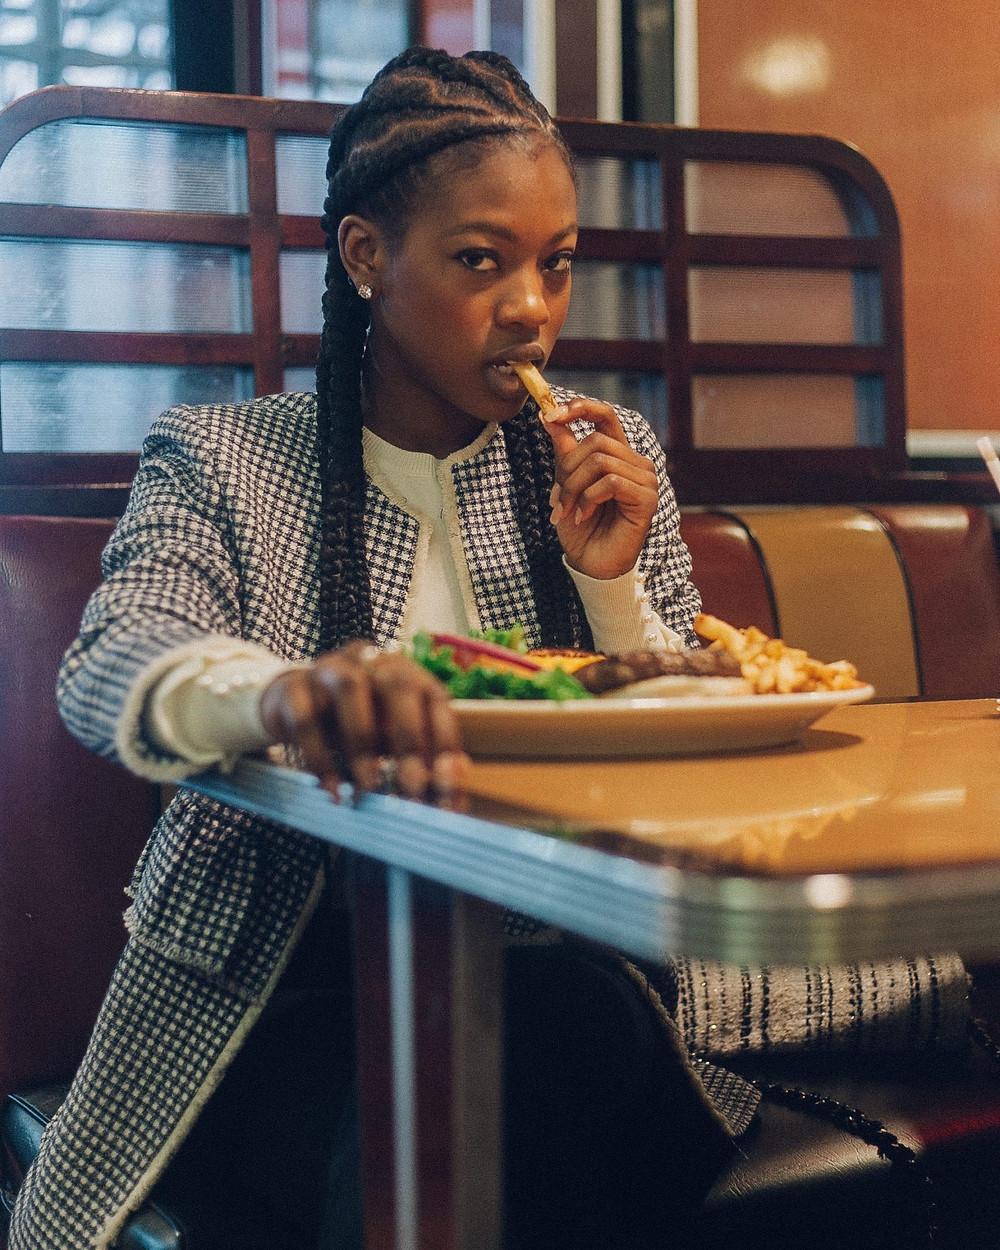 Black girl eating french fries